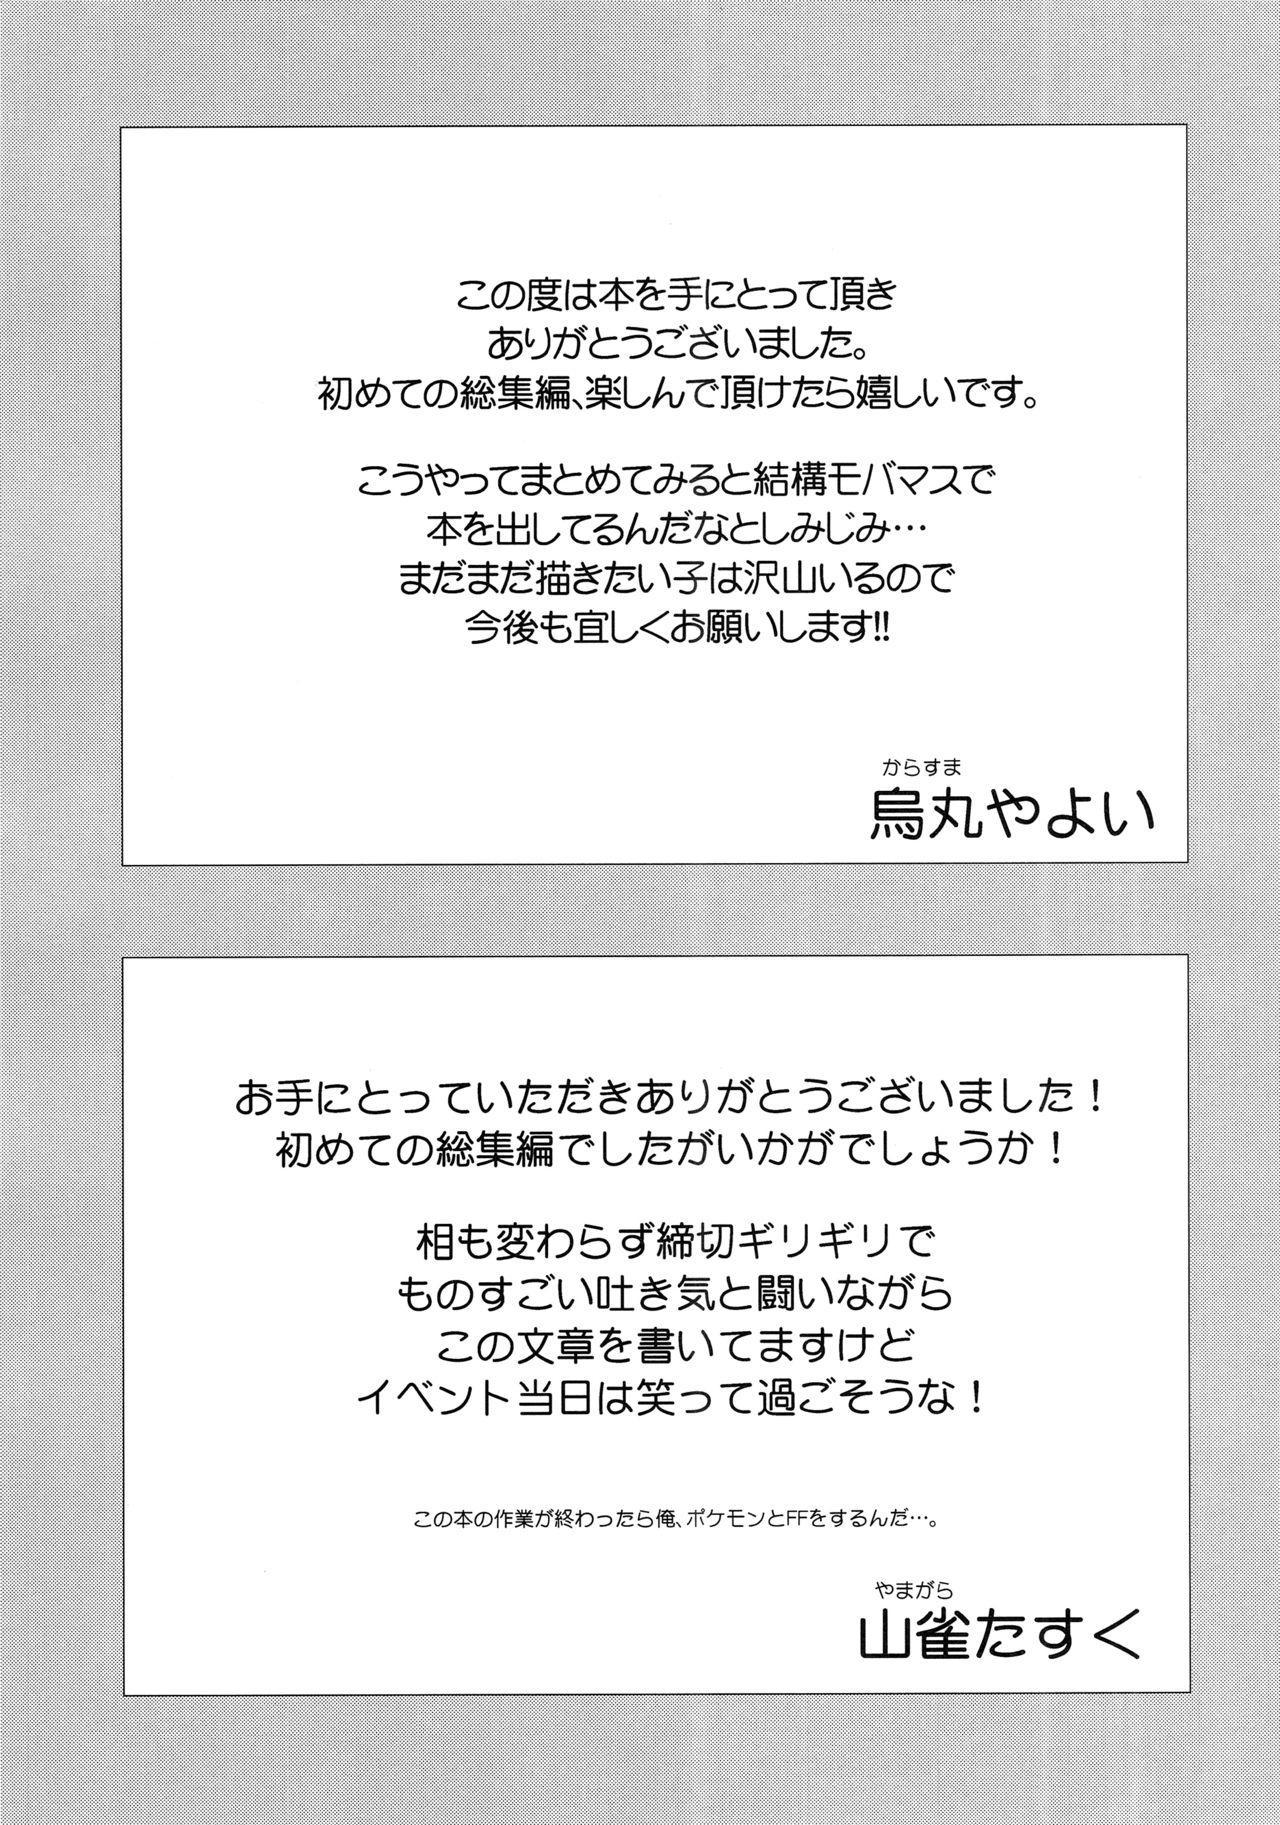 Torokeru Mahou - Melting Magic 109